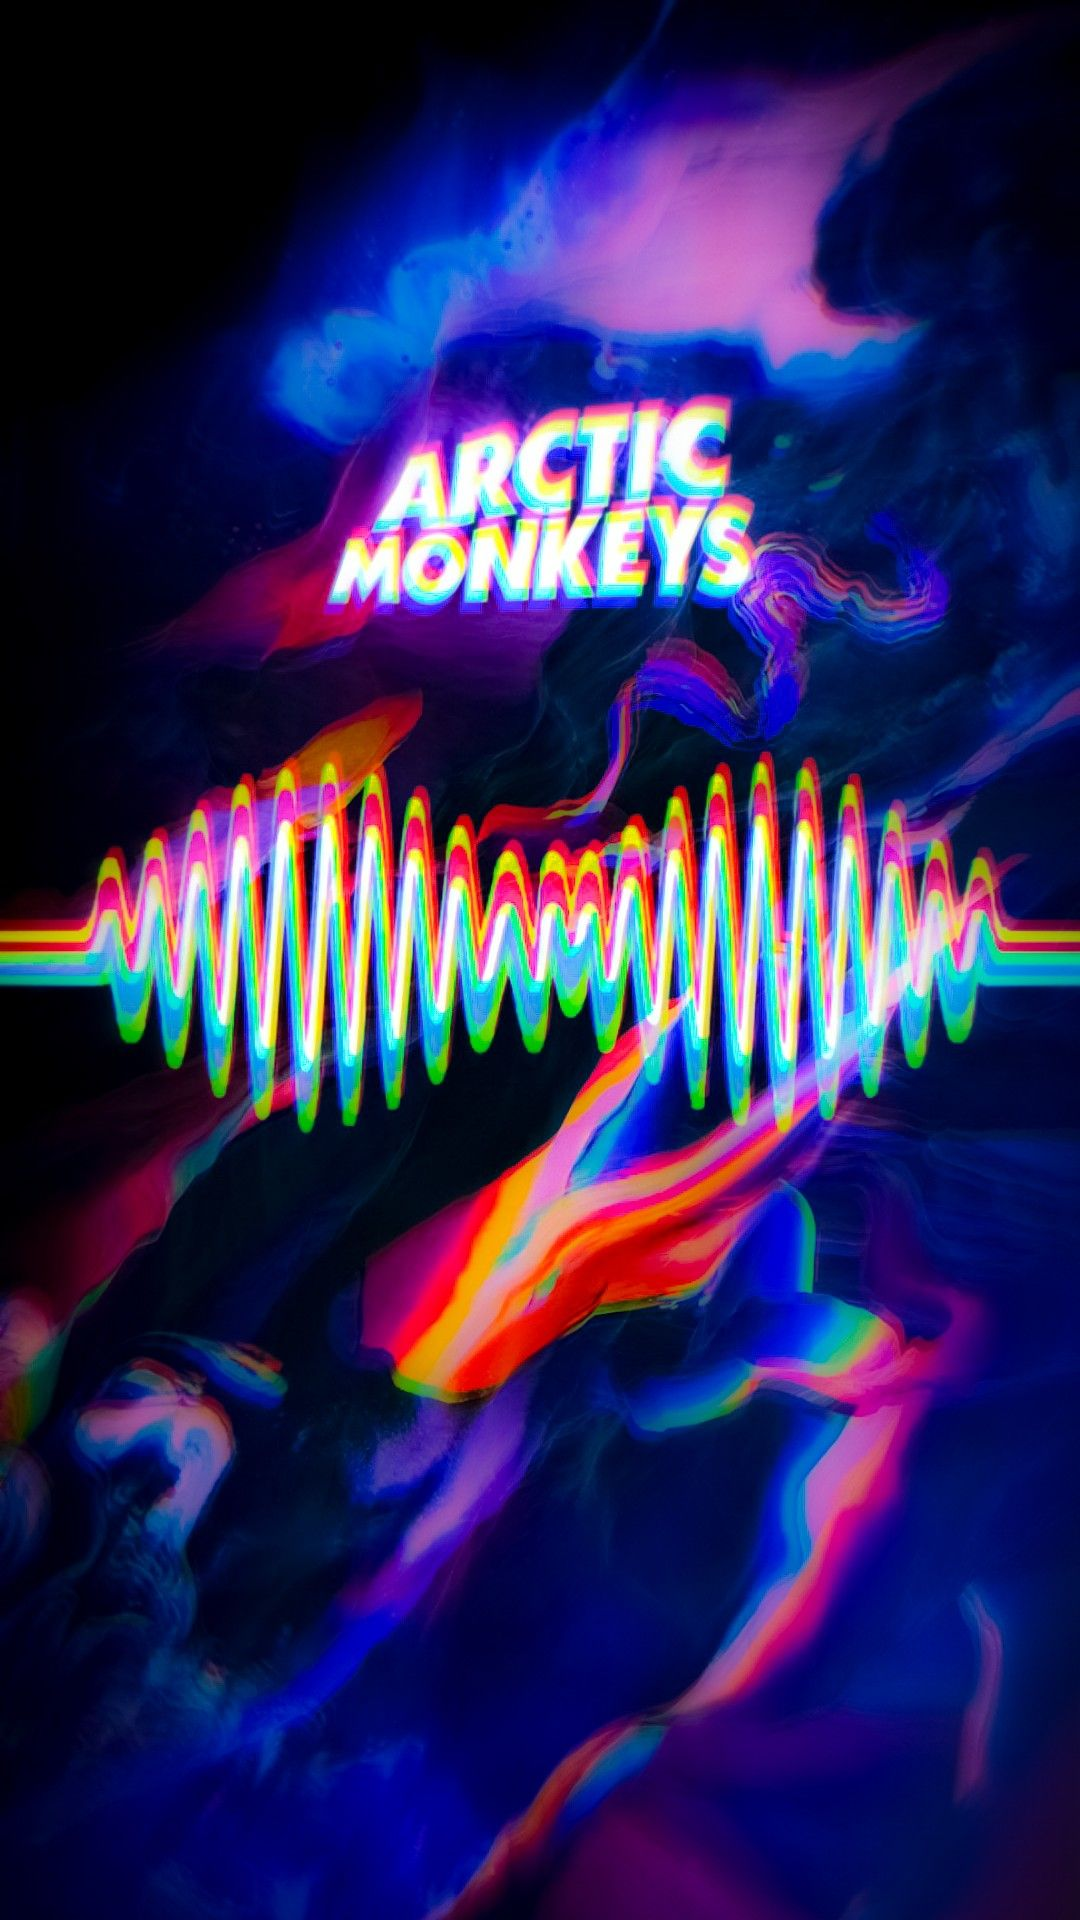 Arctic Monkeys Wallpaper Glitch-Rainbow